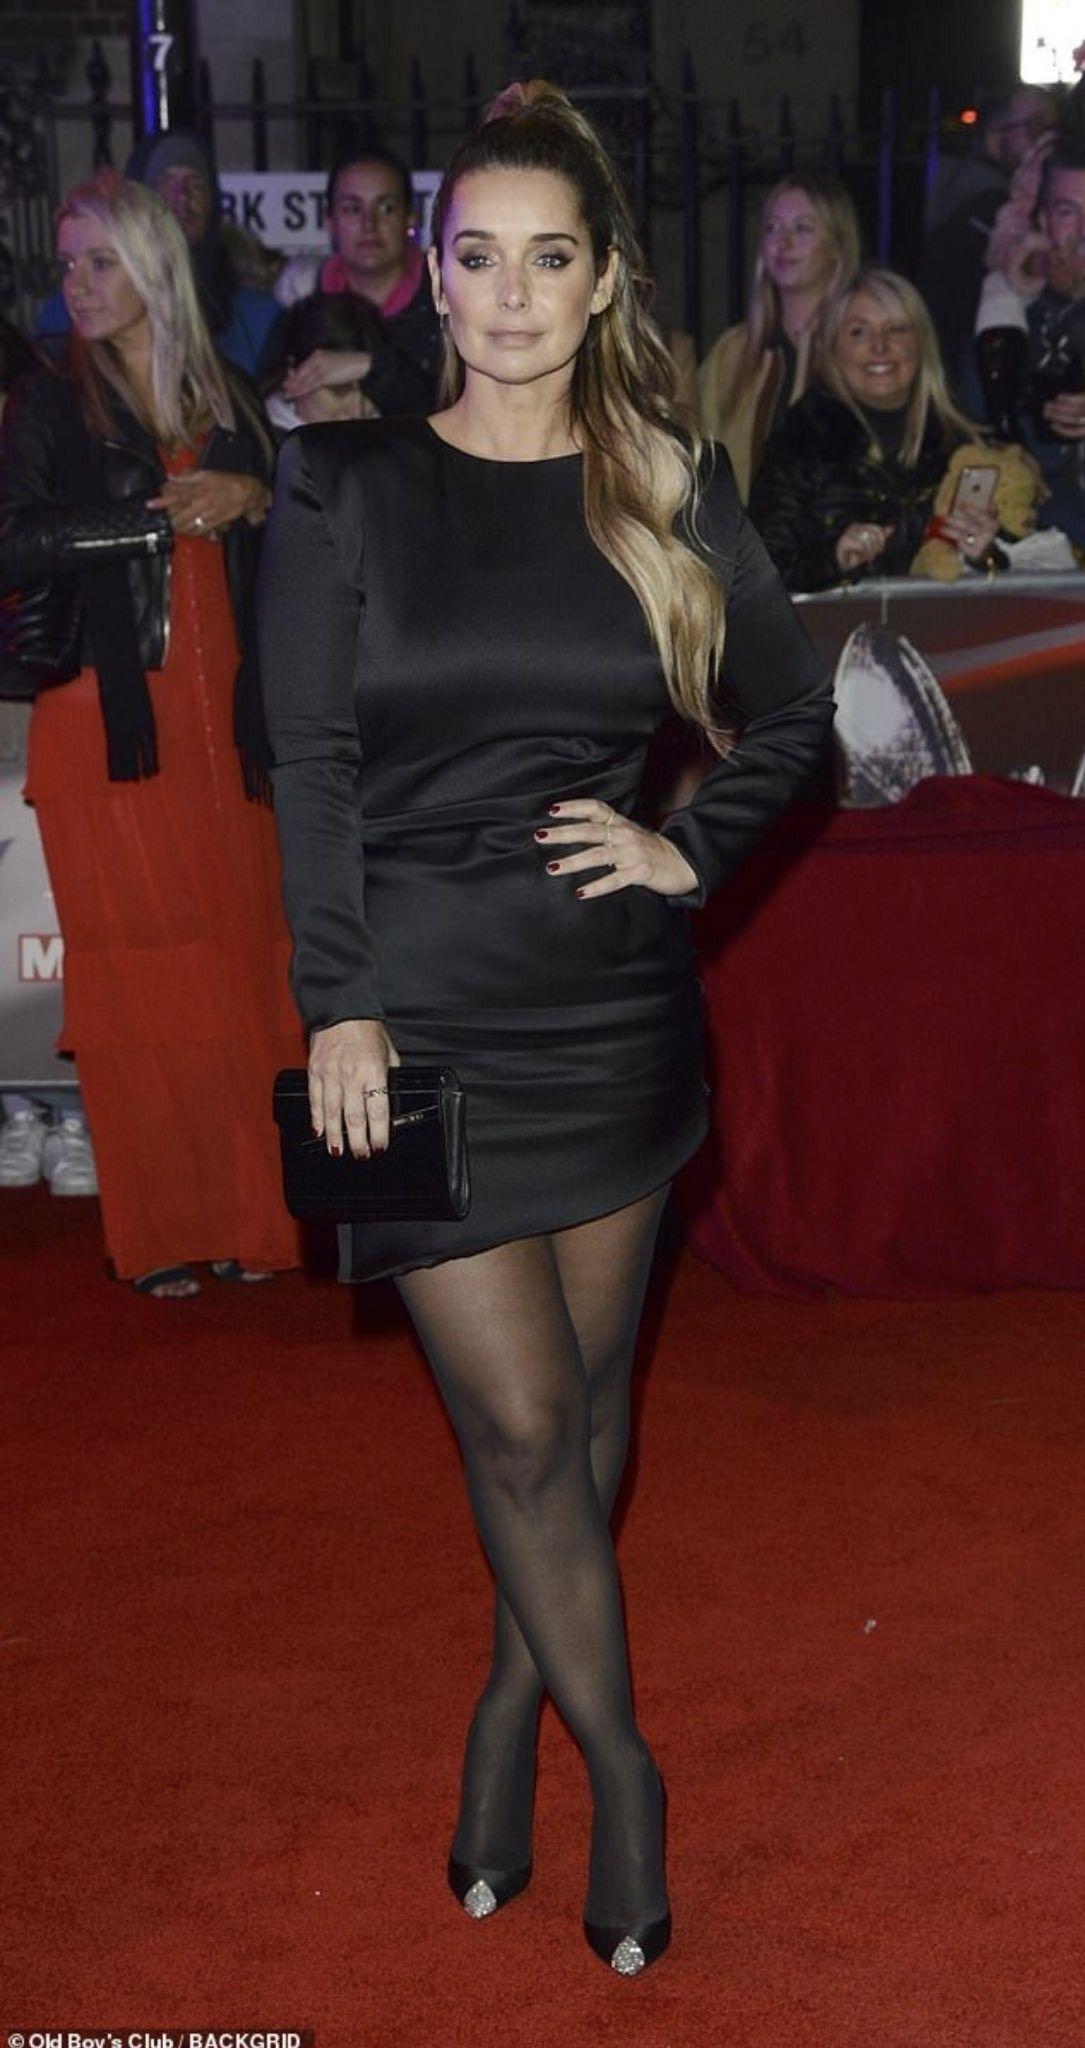 Pin By Jay On Heels N Hose Louise Redknapp Mini Black Dress